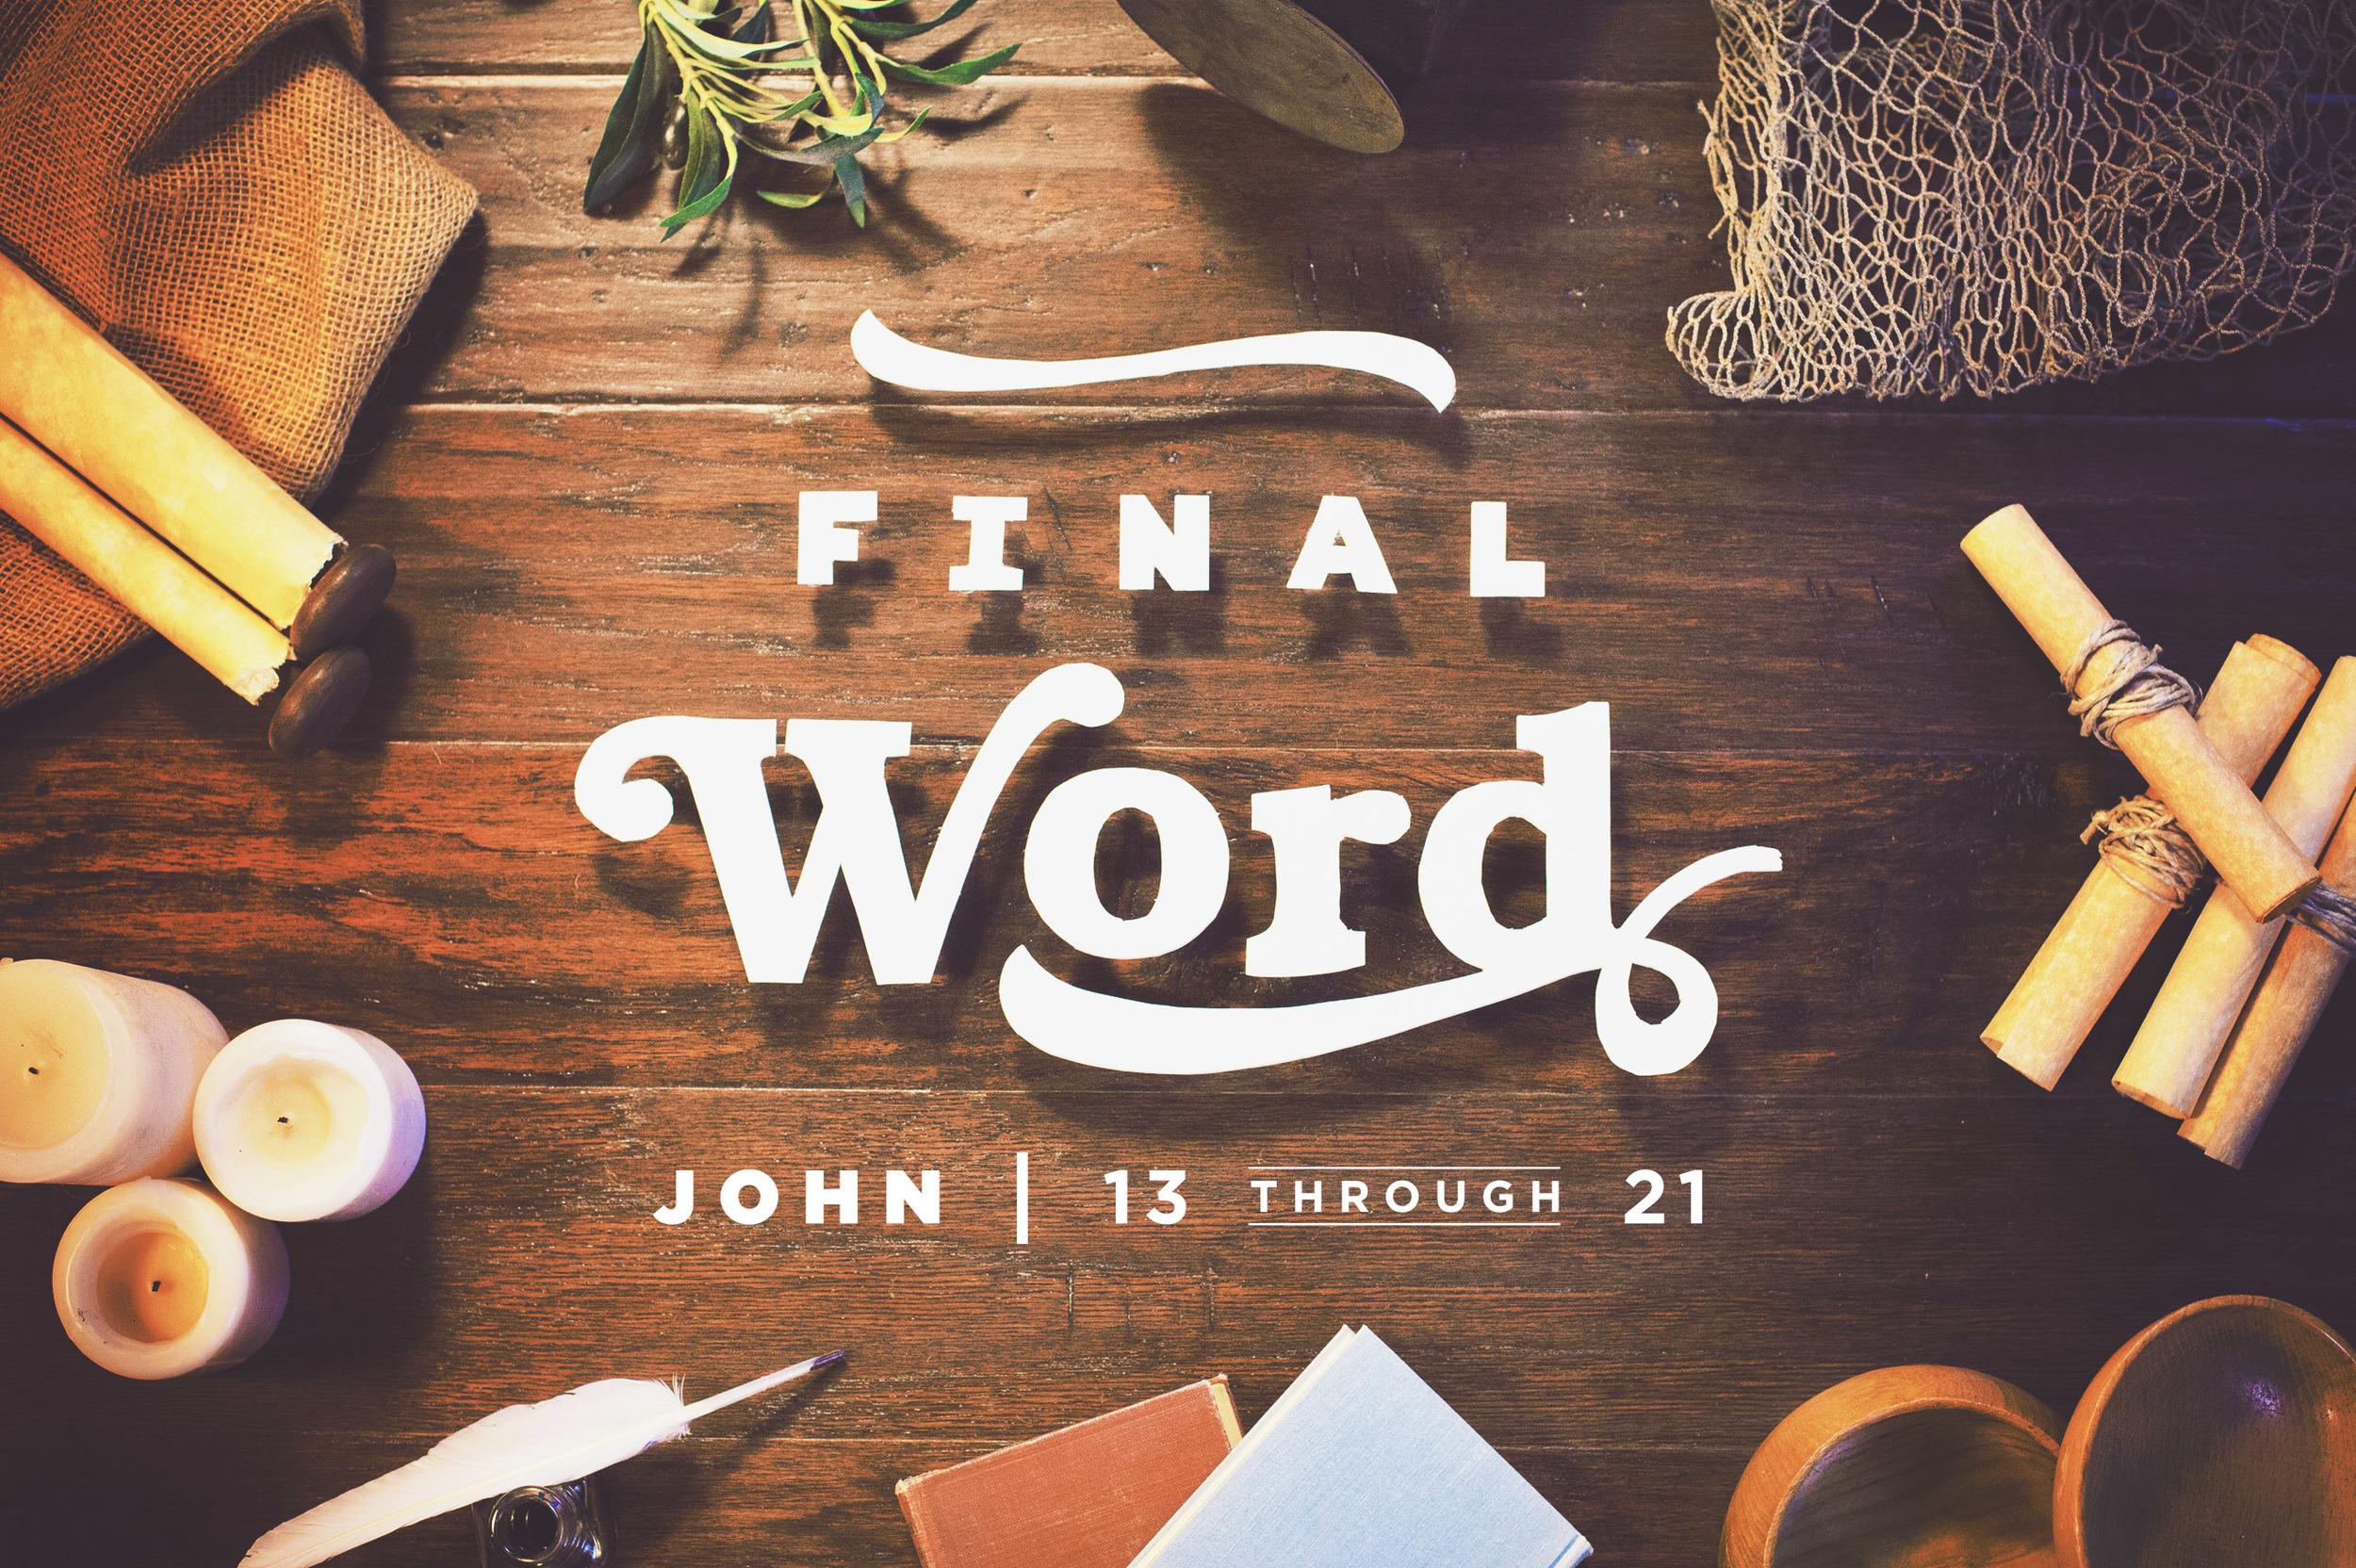 Southeast Christian Church: Final Word | Shane Harris - Melbourne Florida Graphic Design